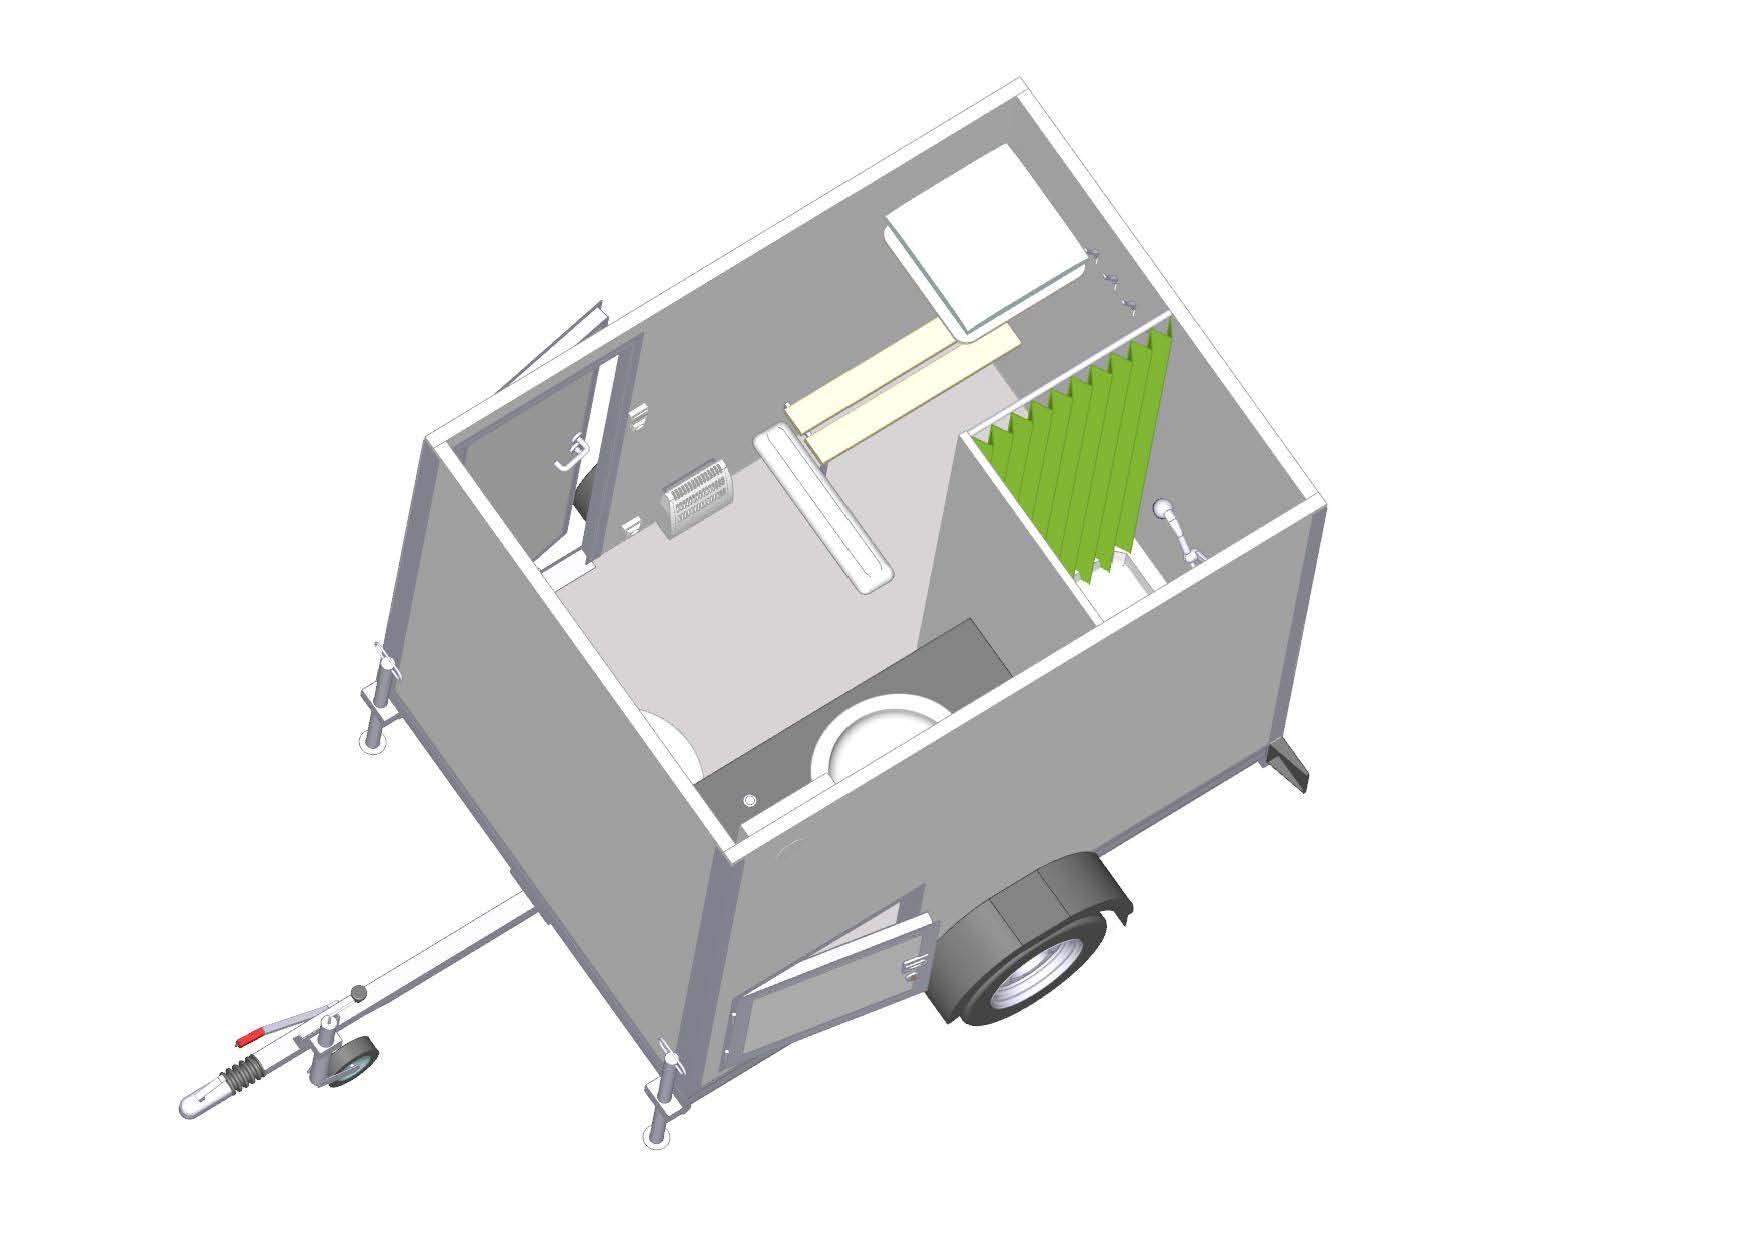 badkamer type 17 3D_Pagina_03.jpg